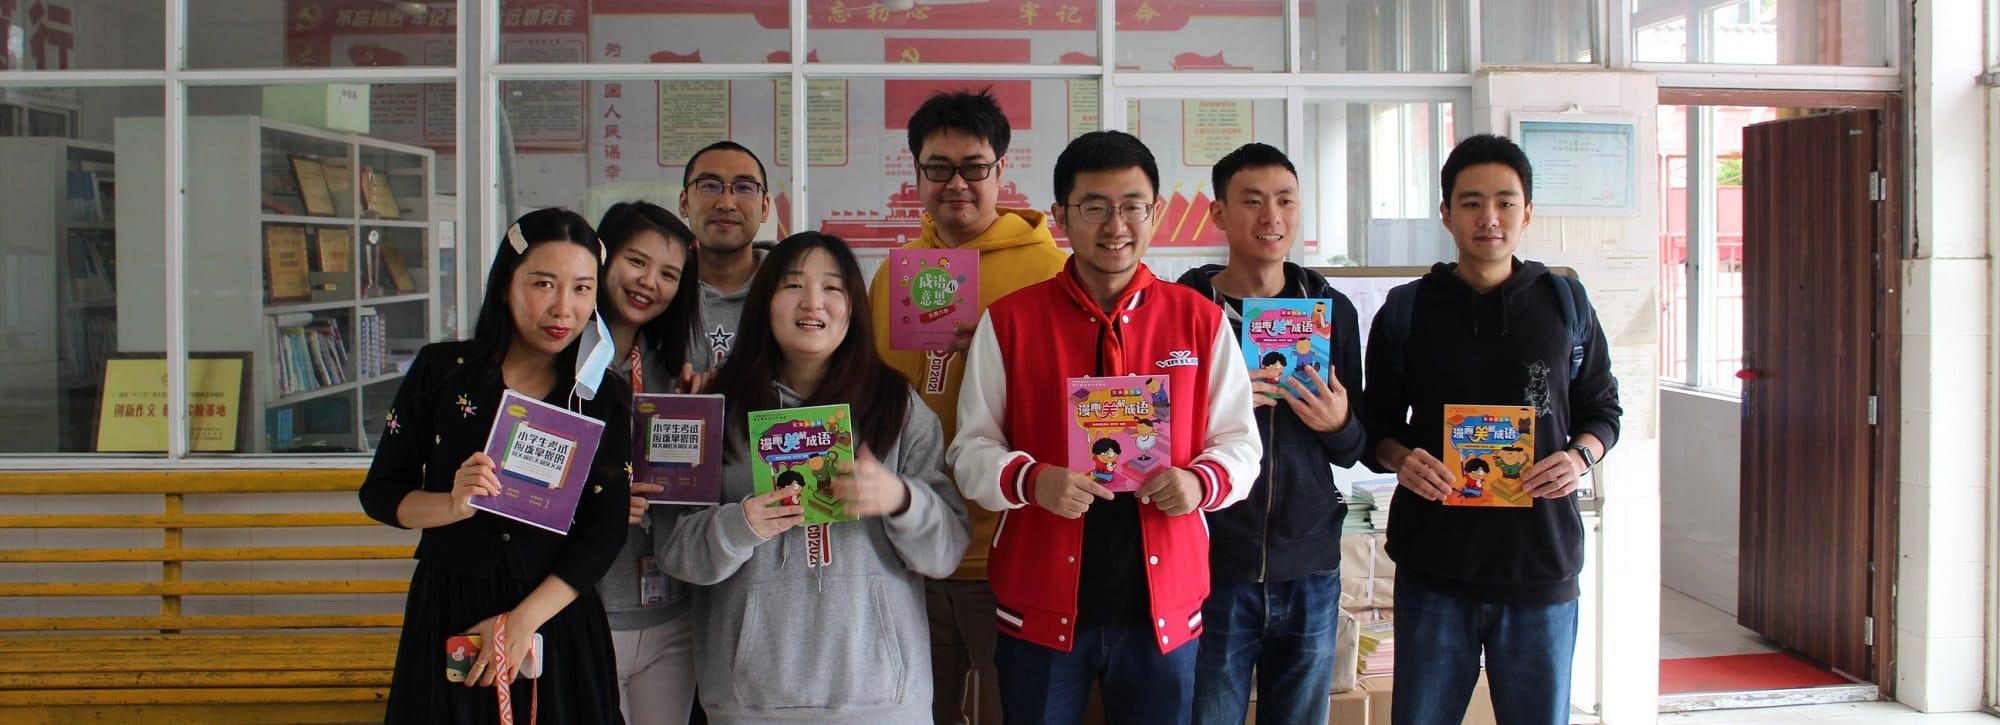 Spreading the Joy of Reading: Virtuos Chengdu Donates Books to Donghua Yucai School